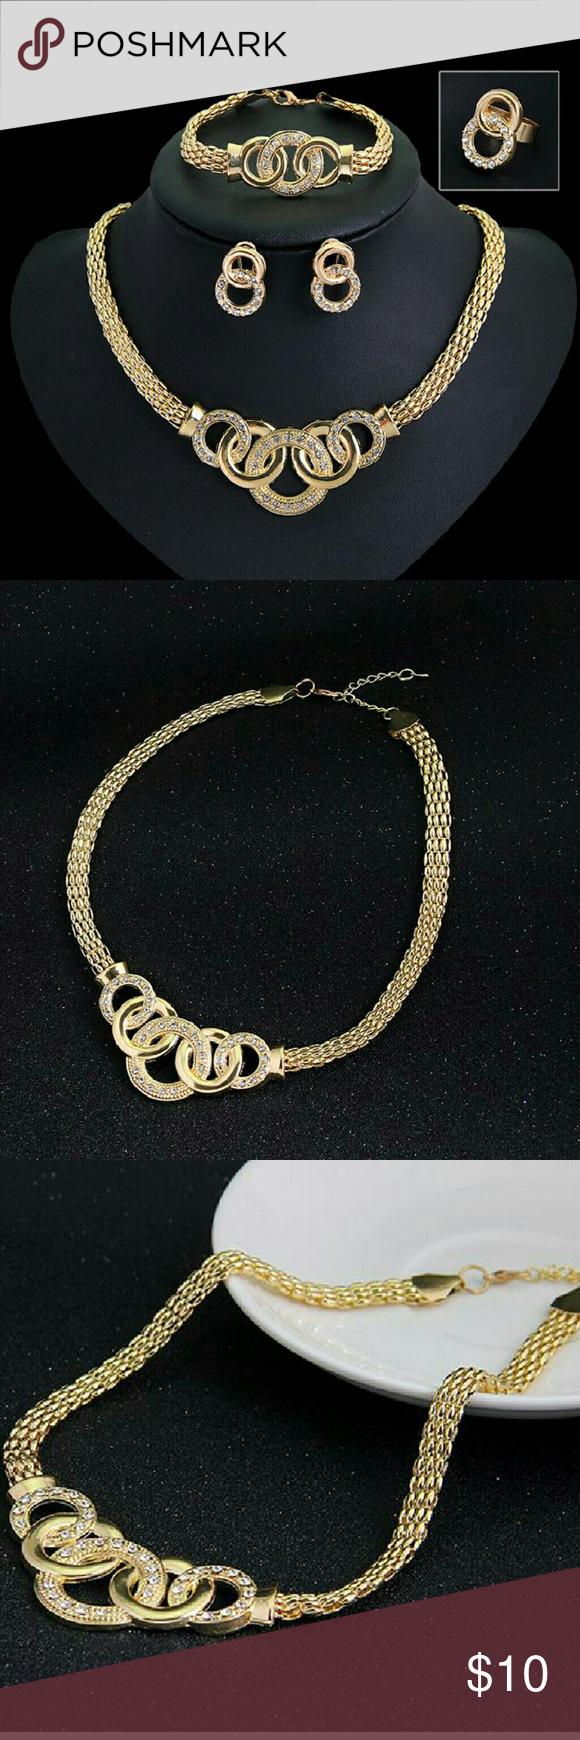 Gilded rhinestone eight laps european crystal handcuffs necklace